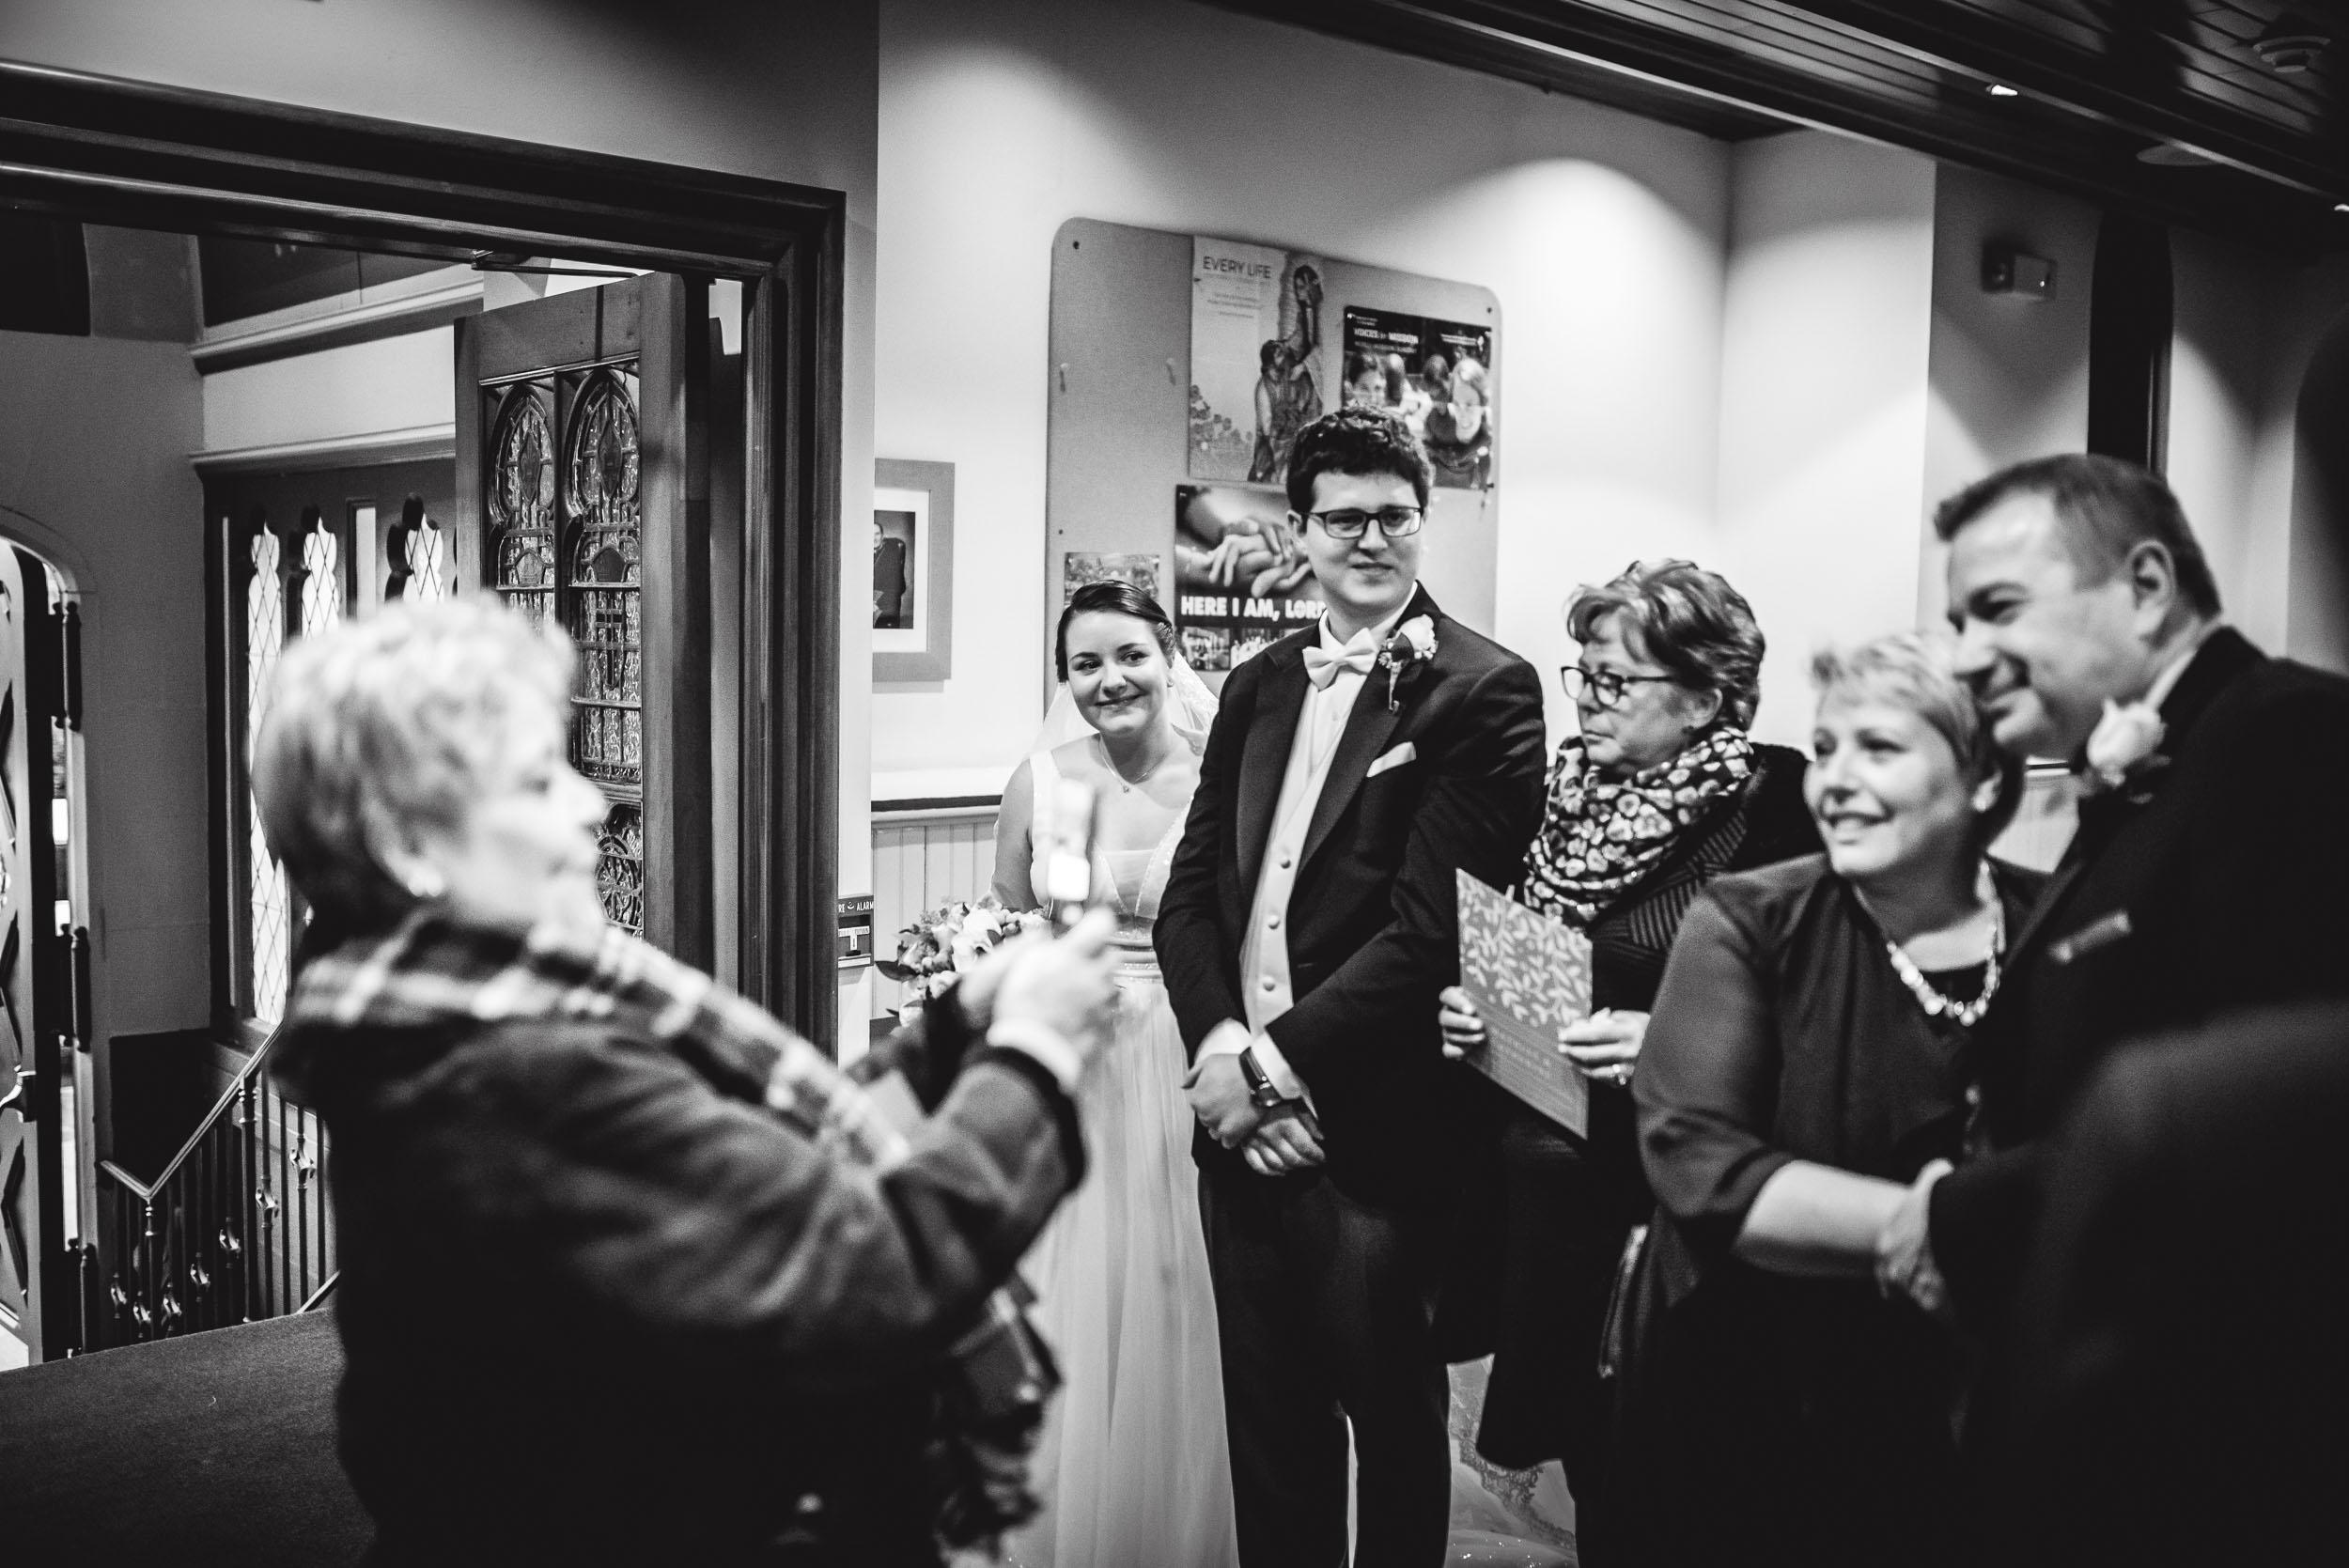 KatieandMathias_Morristown_NewJersey_Wedding_Church_Assumption_Madison_Hotel(42of65).jpg